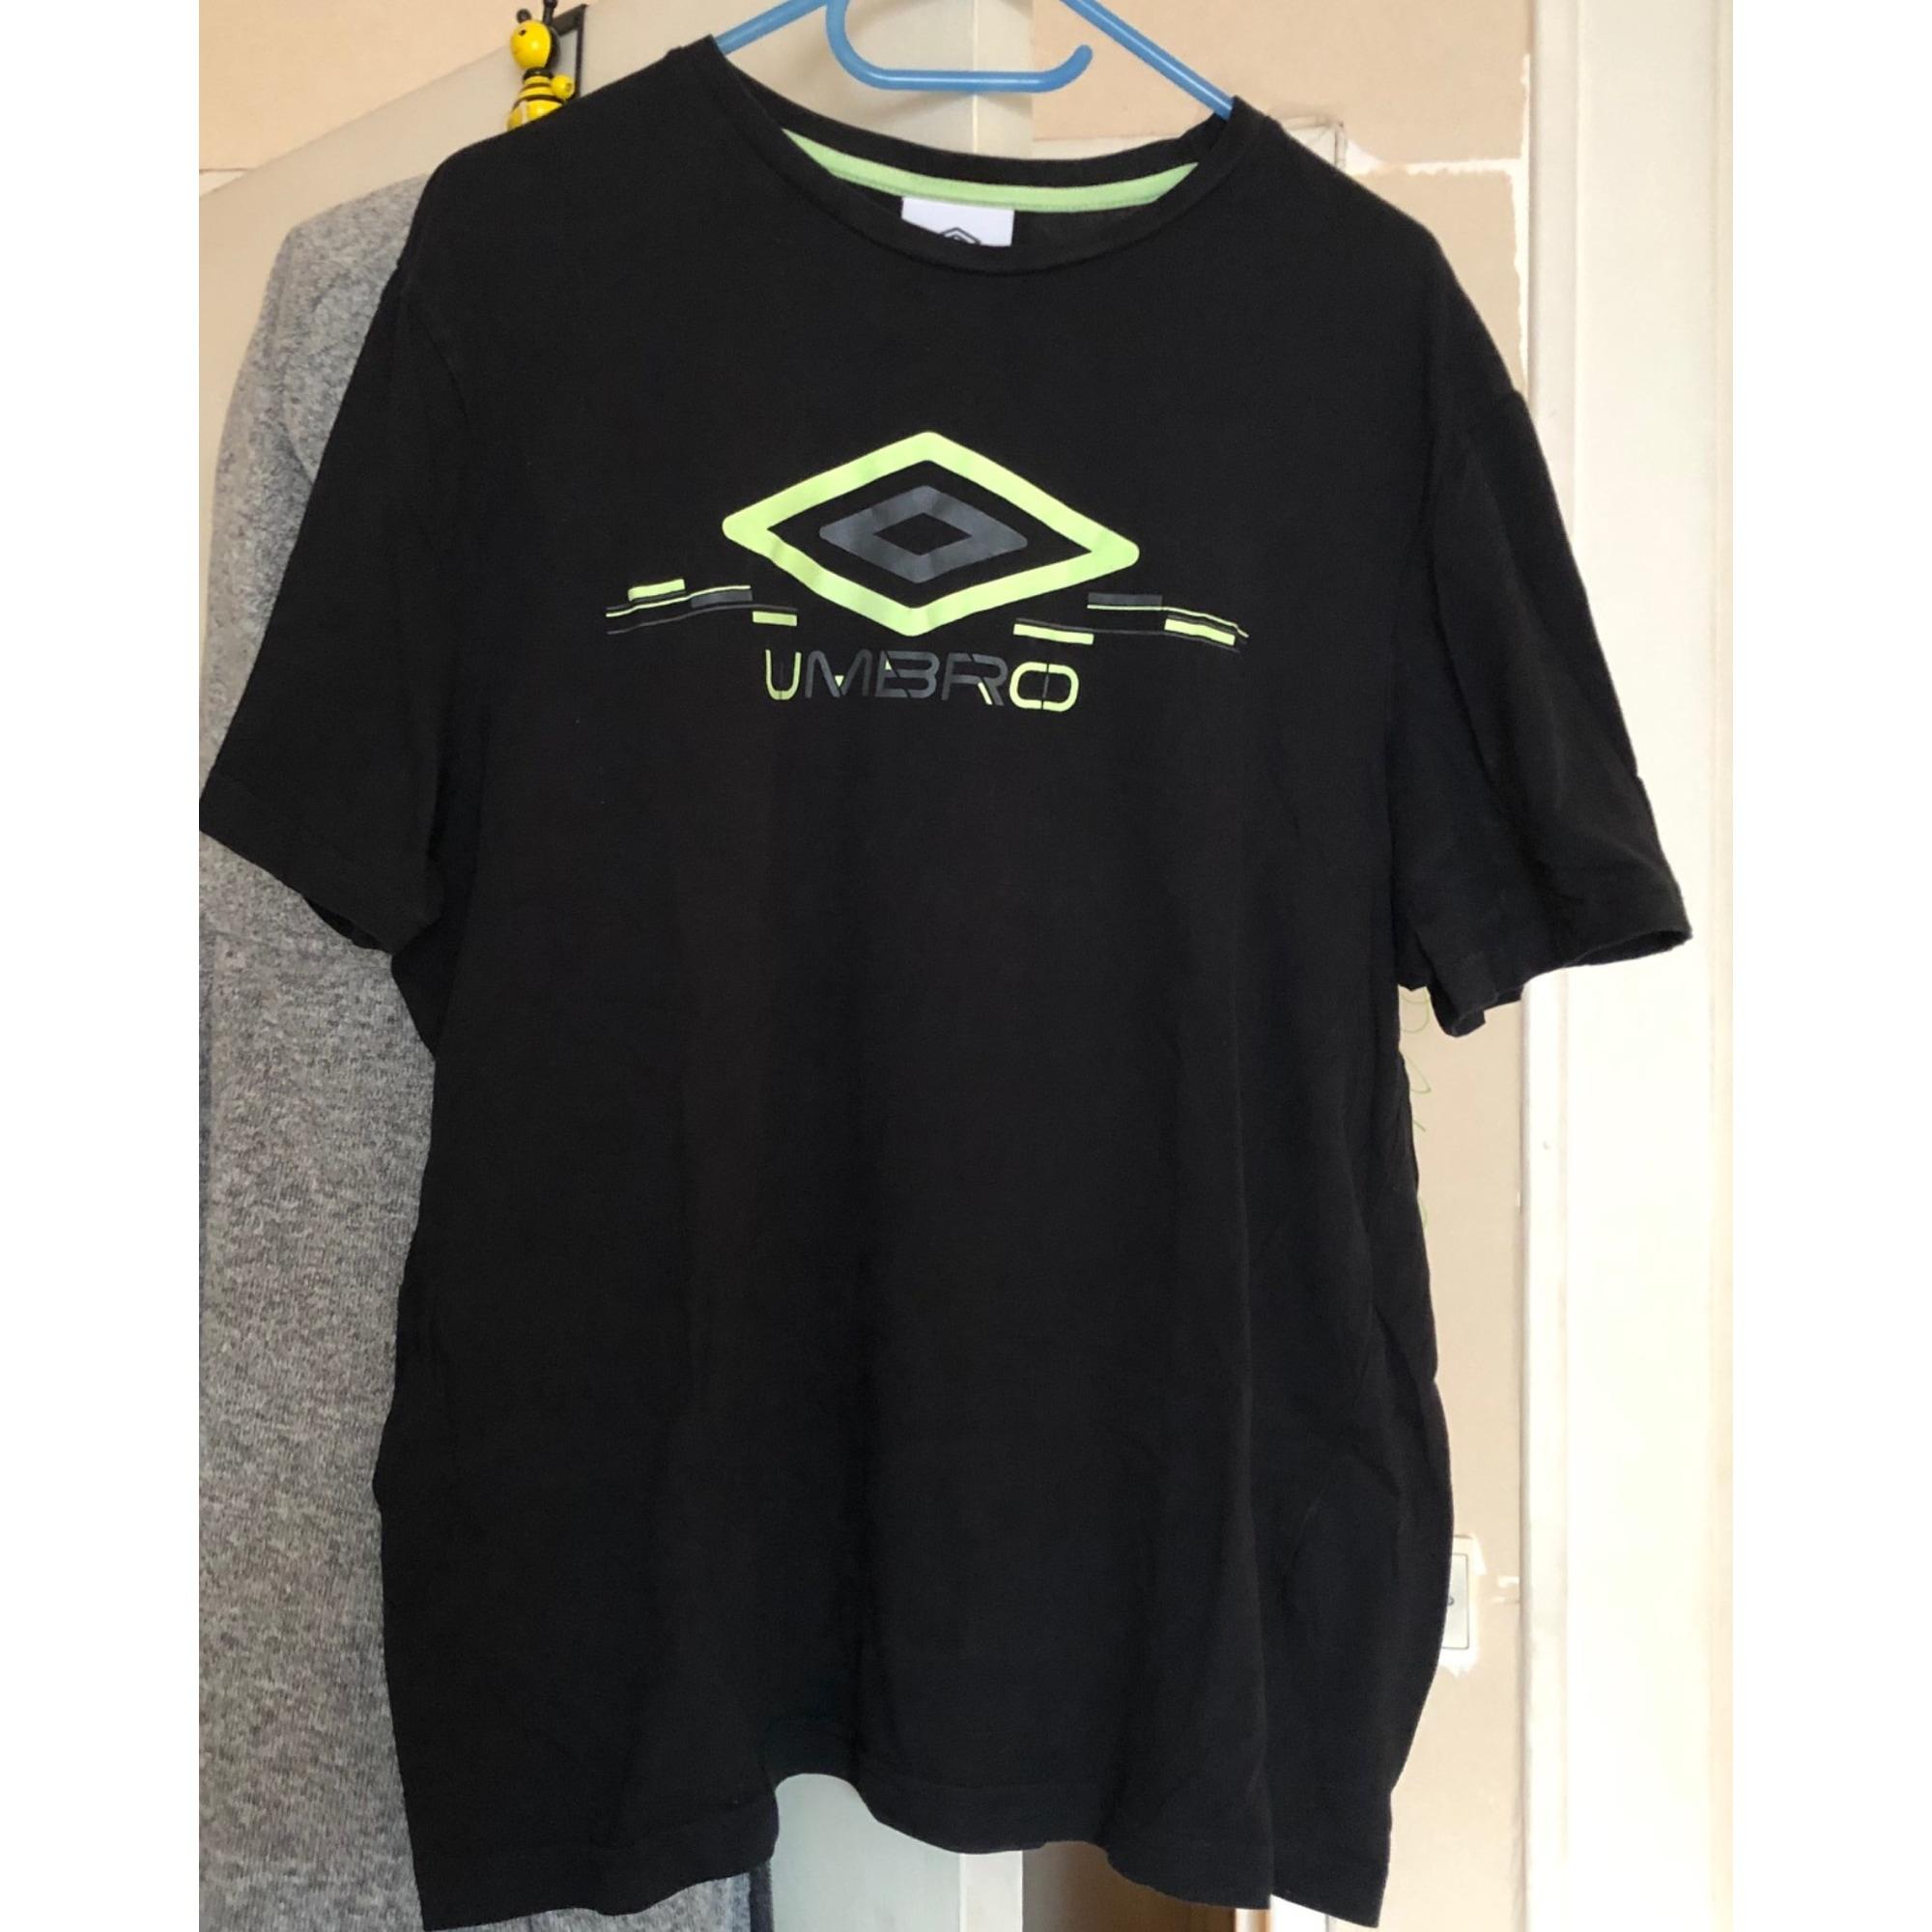 T-shirt UMBRO Black